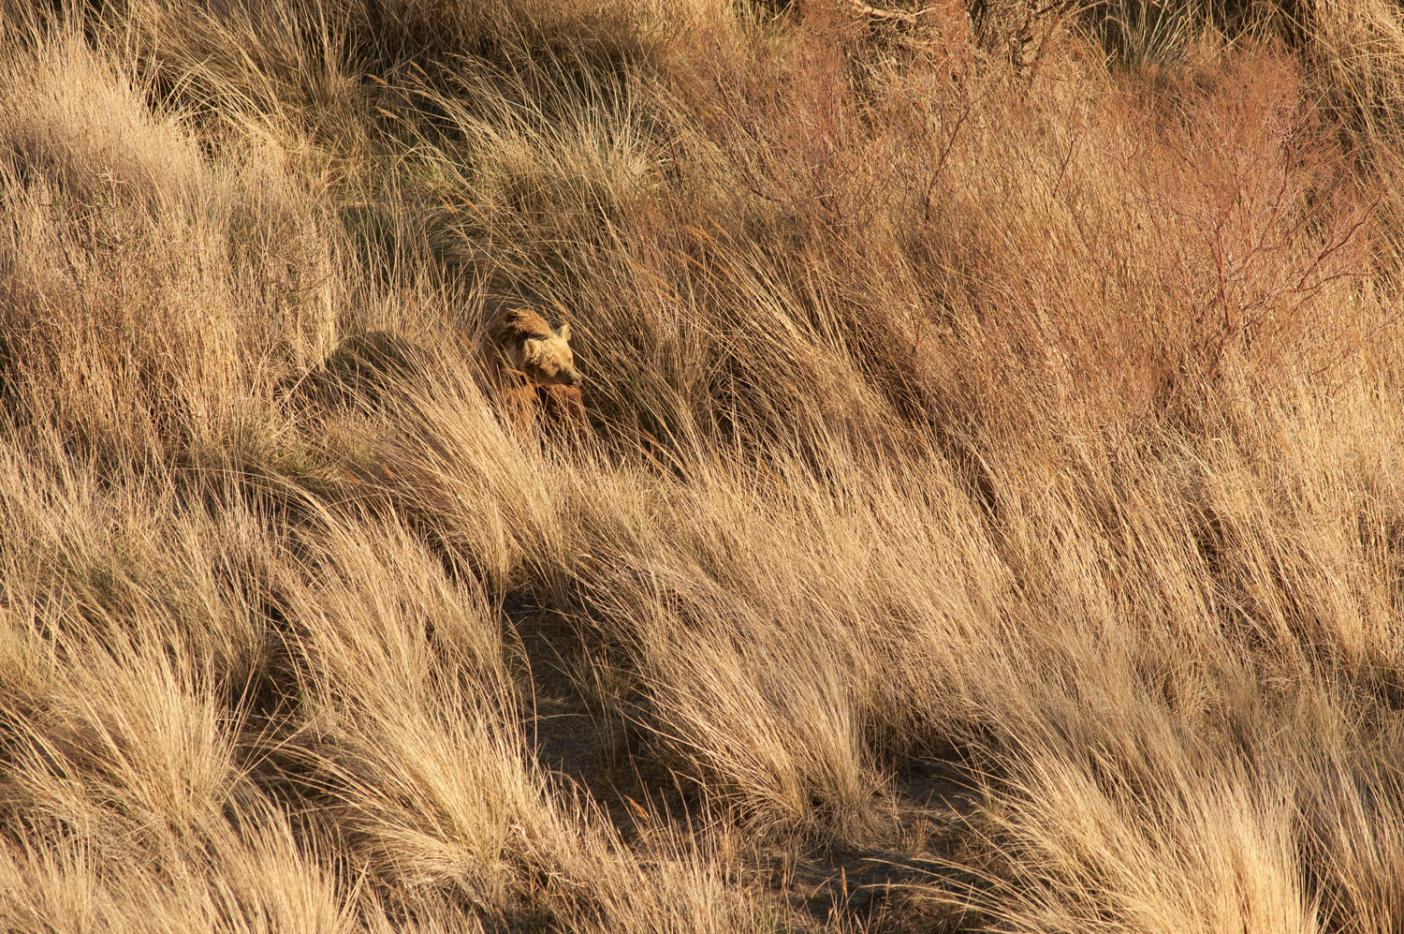 Big Bawa among the Phragmites grasses at the oasis where he was radio-collared. Photo: Joe Riis